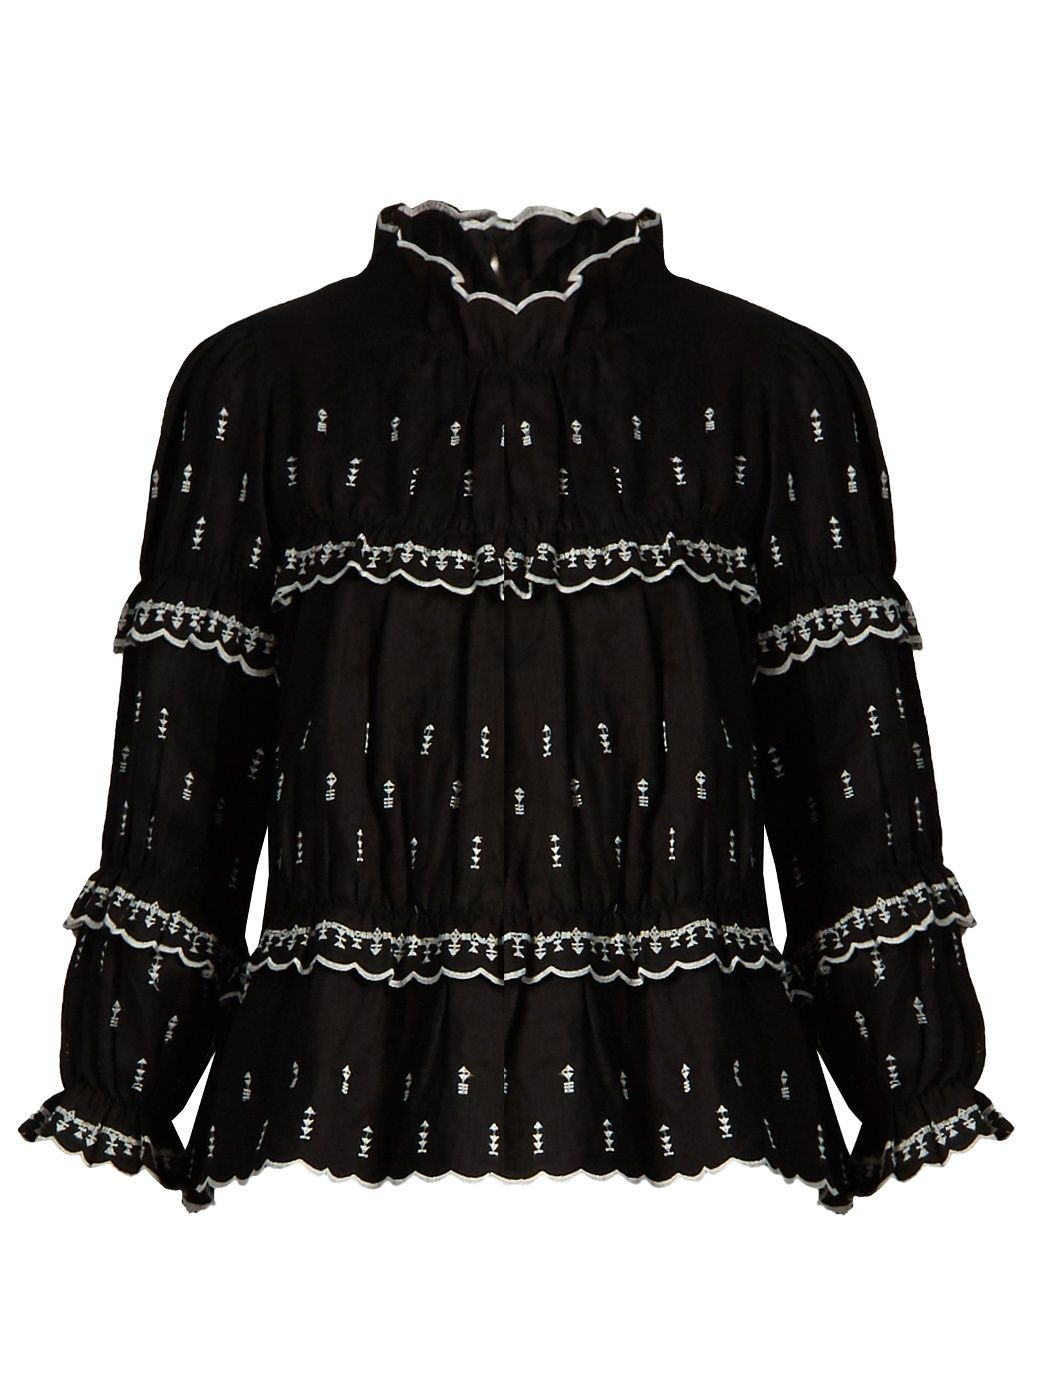 4420d090f63c7 Saint Laurent Metallic striped silk-blend chiffon shirt (£1